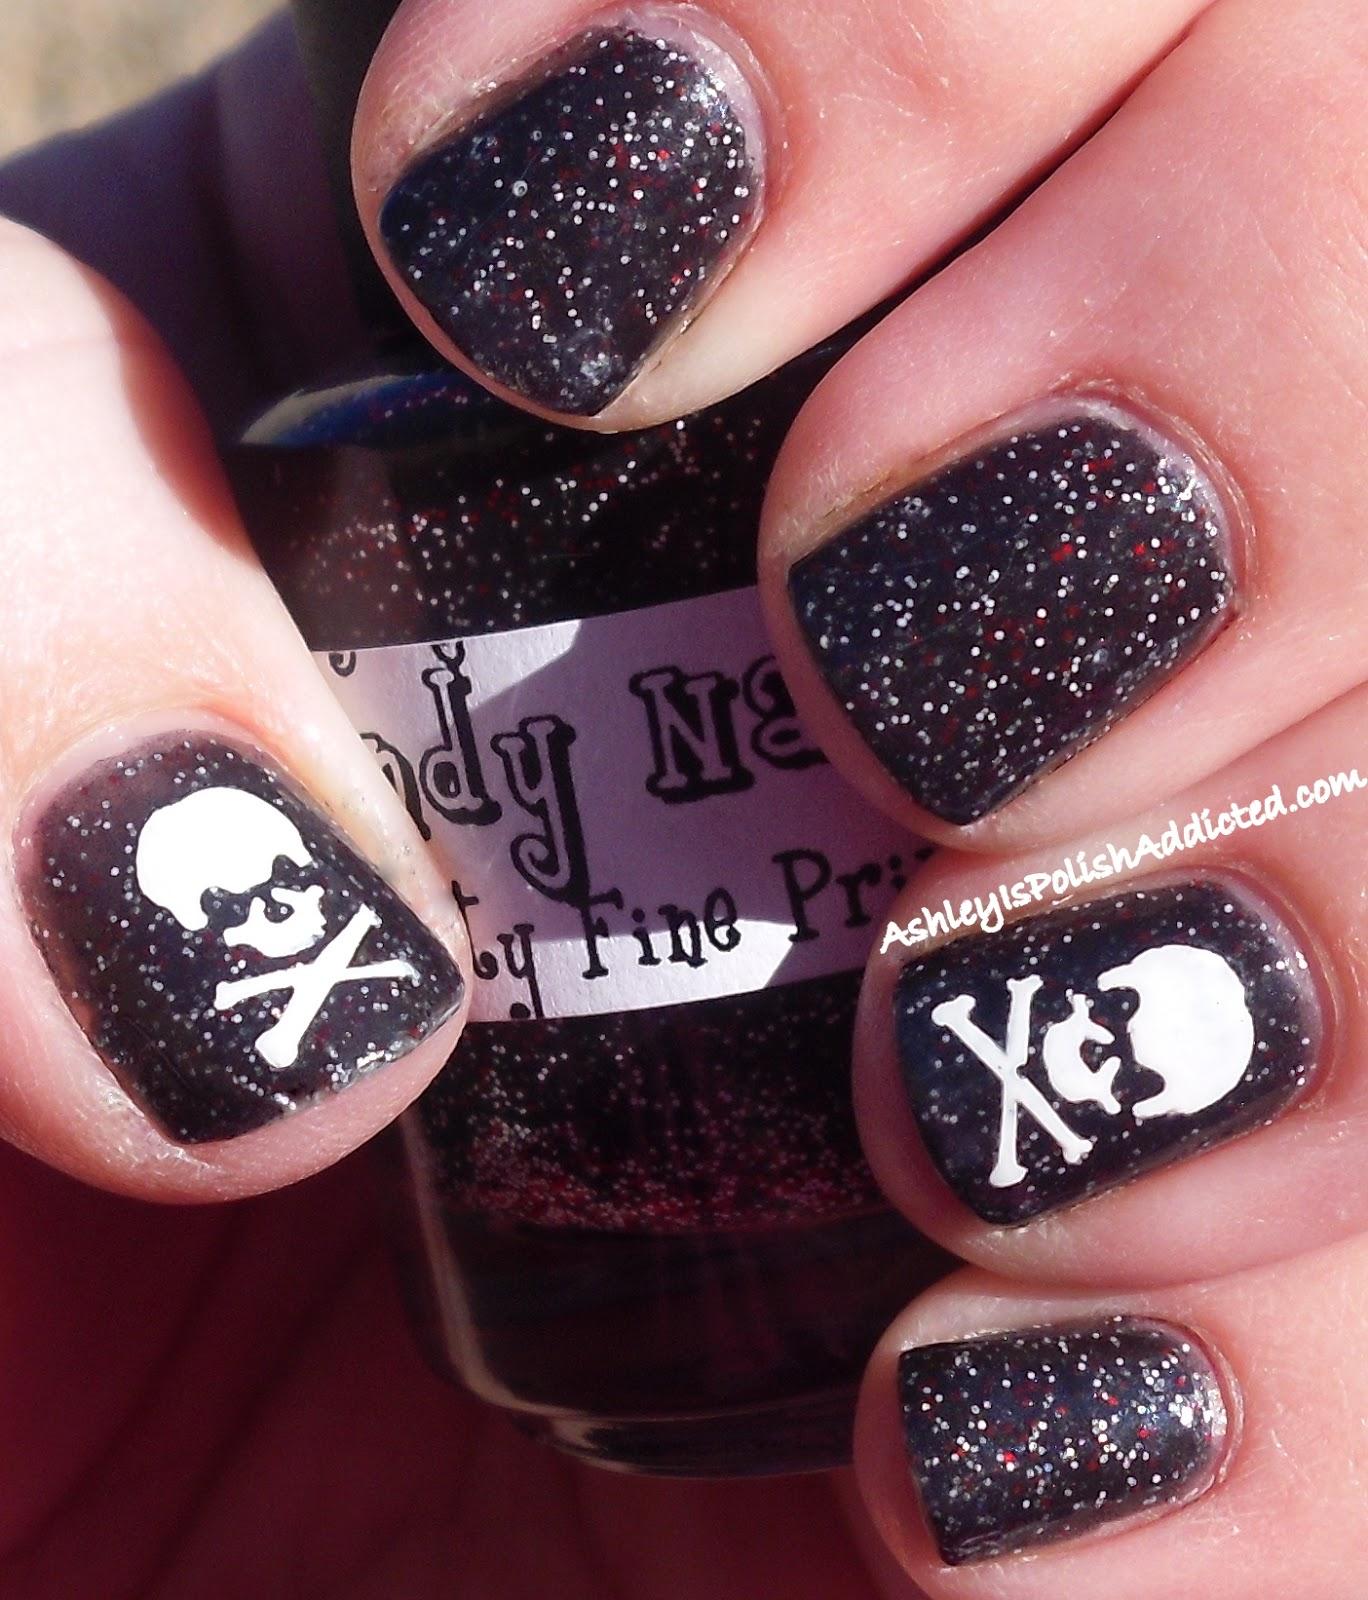 Ashley is PolishAddicted: Skull Mani Using Revlon Nail Art Stencils